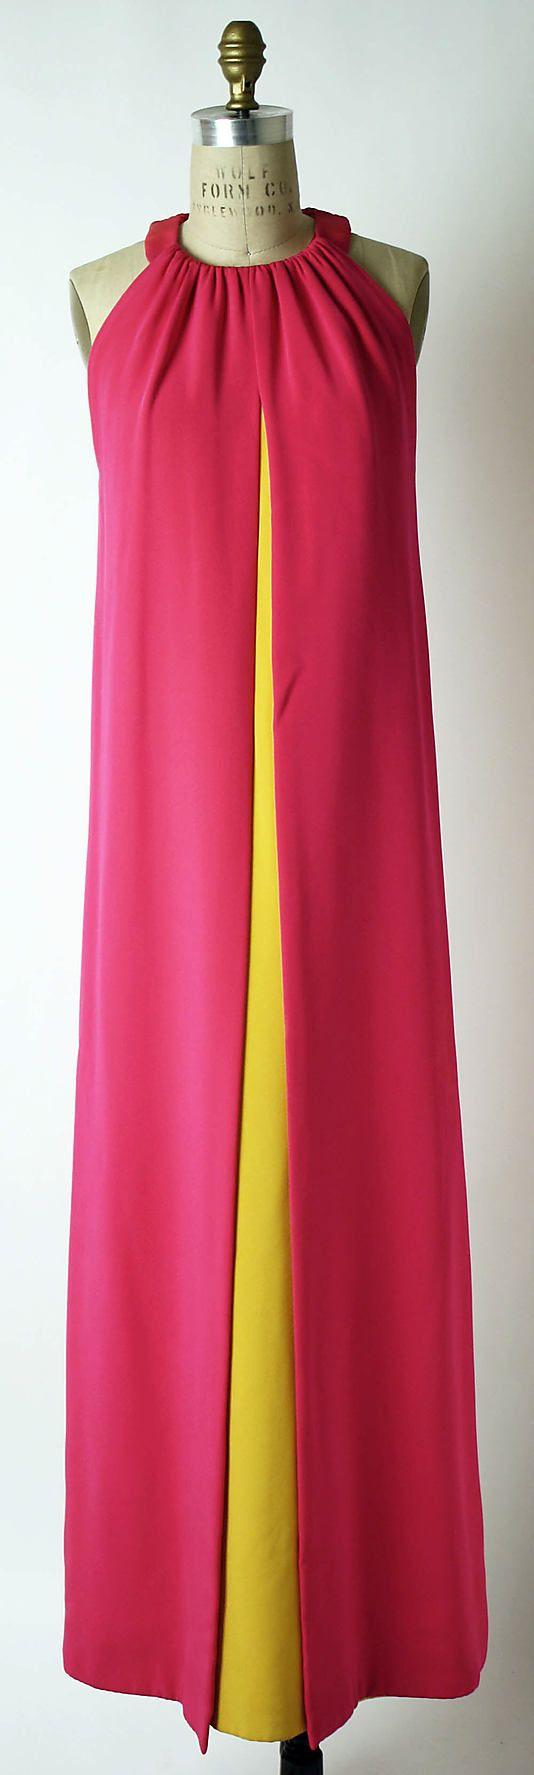 Evening ensemble ca. 1965 Yves Saint Laurent#Reine #ReineWorld #RW #SequinDress #SequinWorld #EveningDress #PartyDress #Dress #DressesInAmman #Fashionista #FashionAddict #BeReine #BeStylish #BeFashion #Amman #Jordan #JO #AFW #2014 #YOLO #InstaReine #Dresses #ReineJordan #ReineJo #Dubai